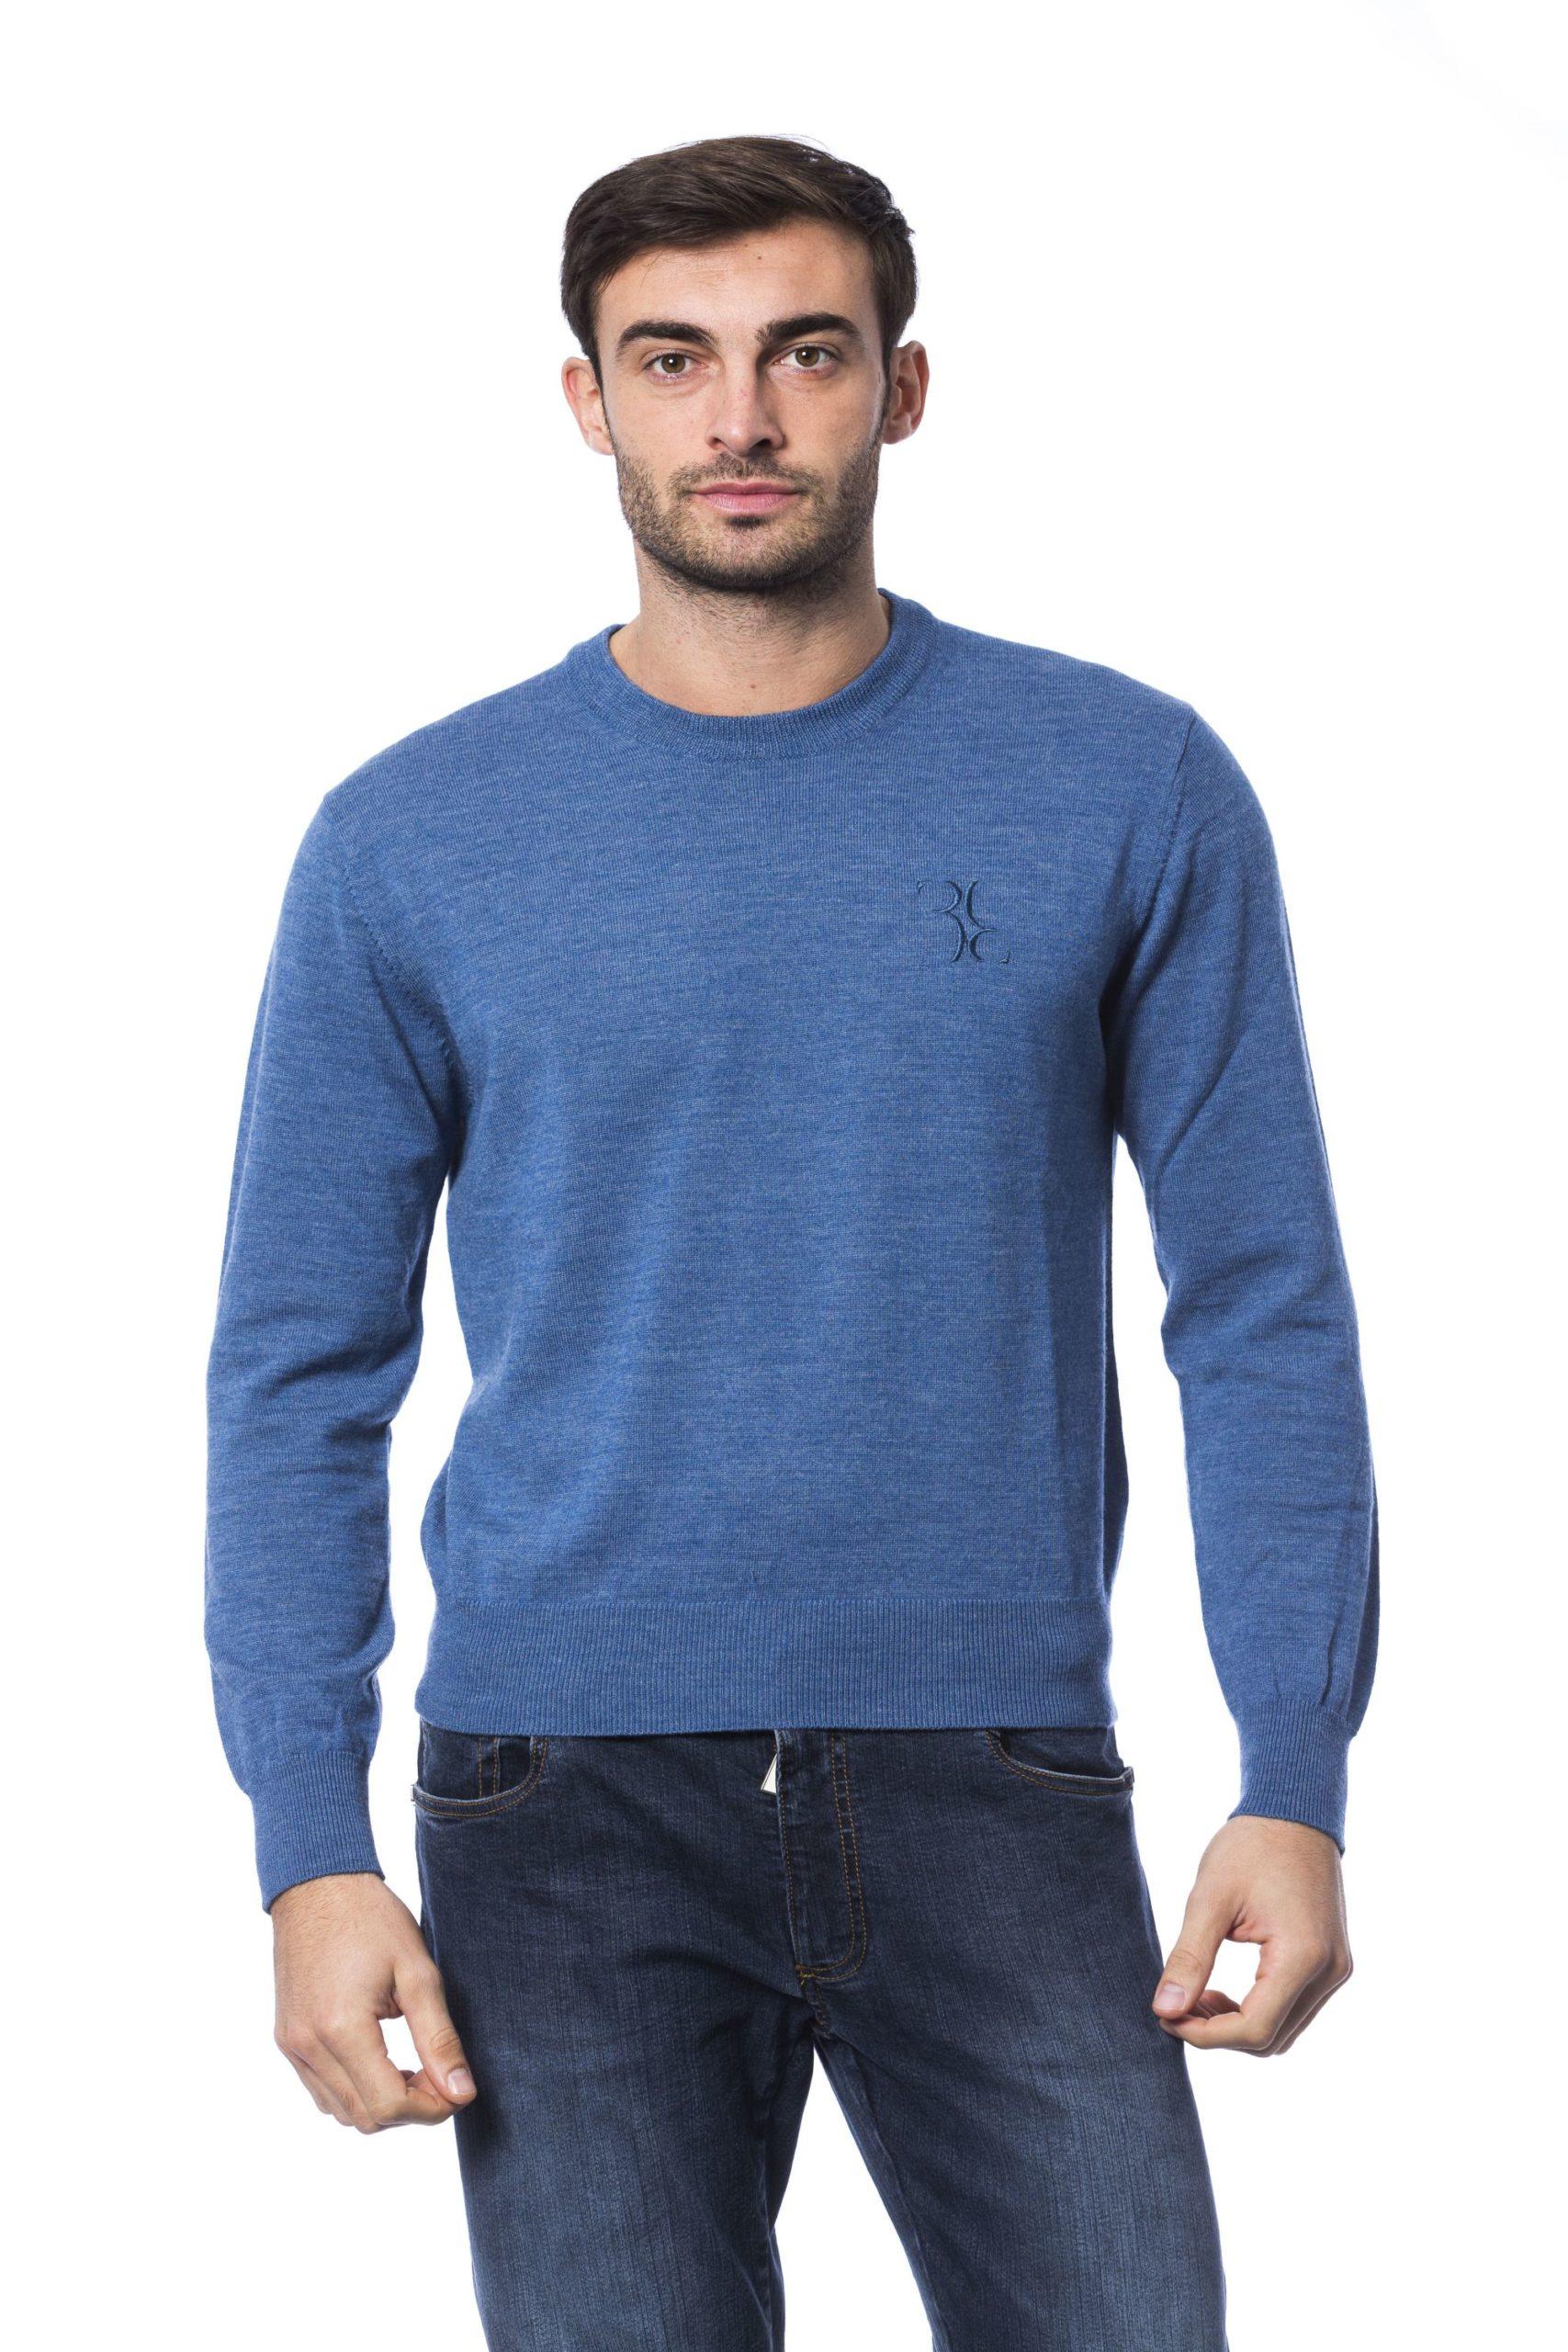 Billionaire Italian Couture Men's Avio Sweater Blue BI816576 - S